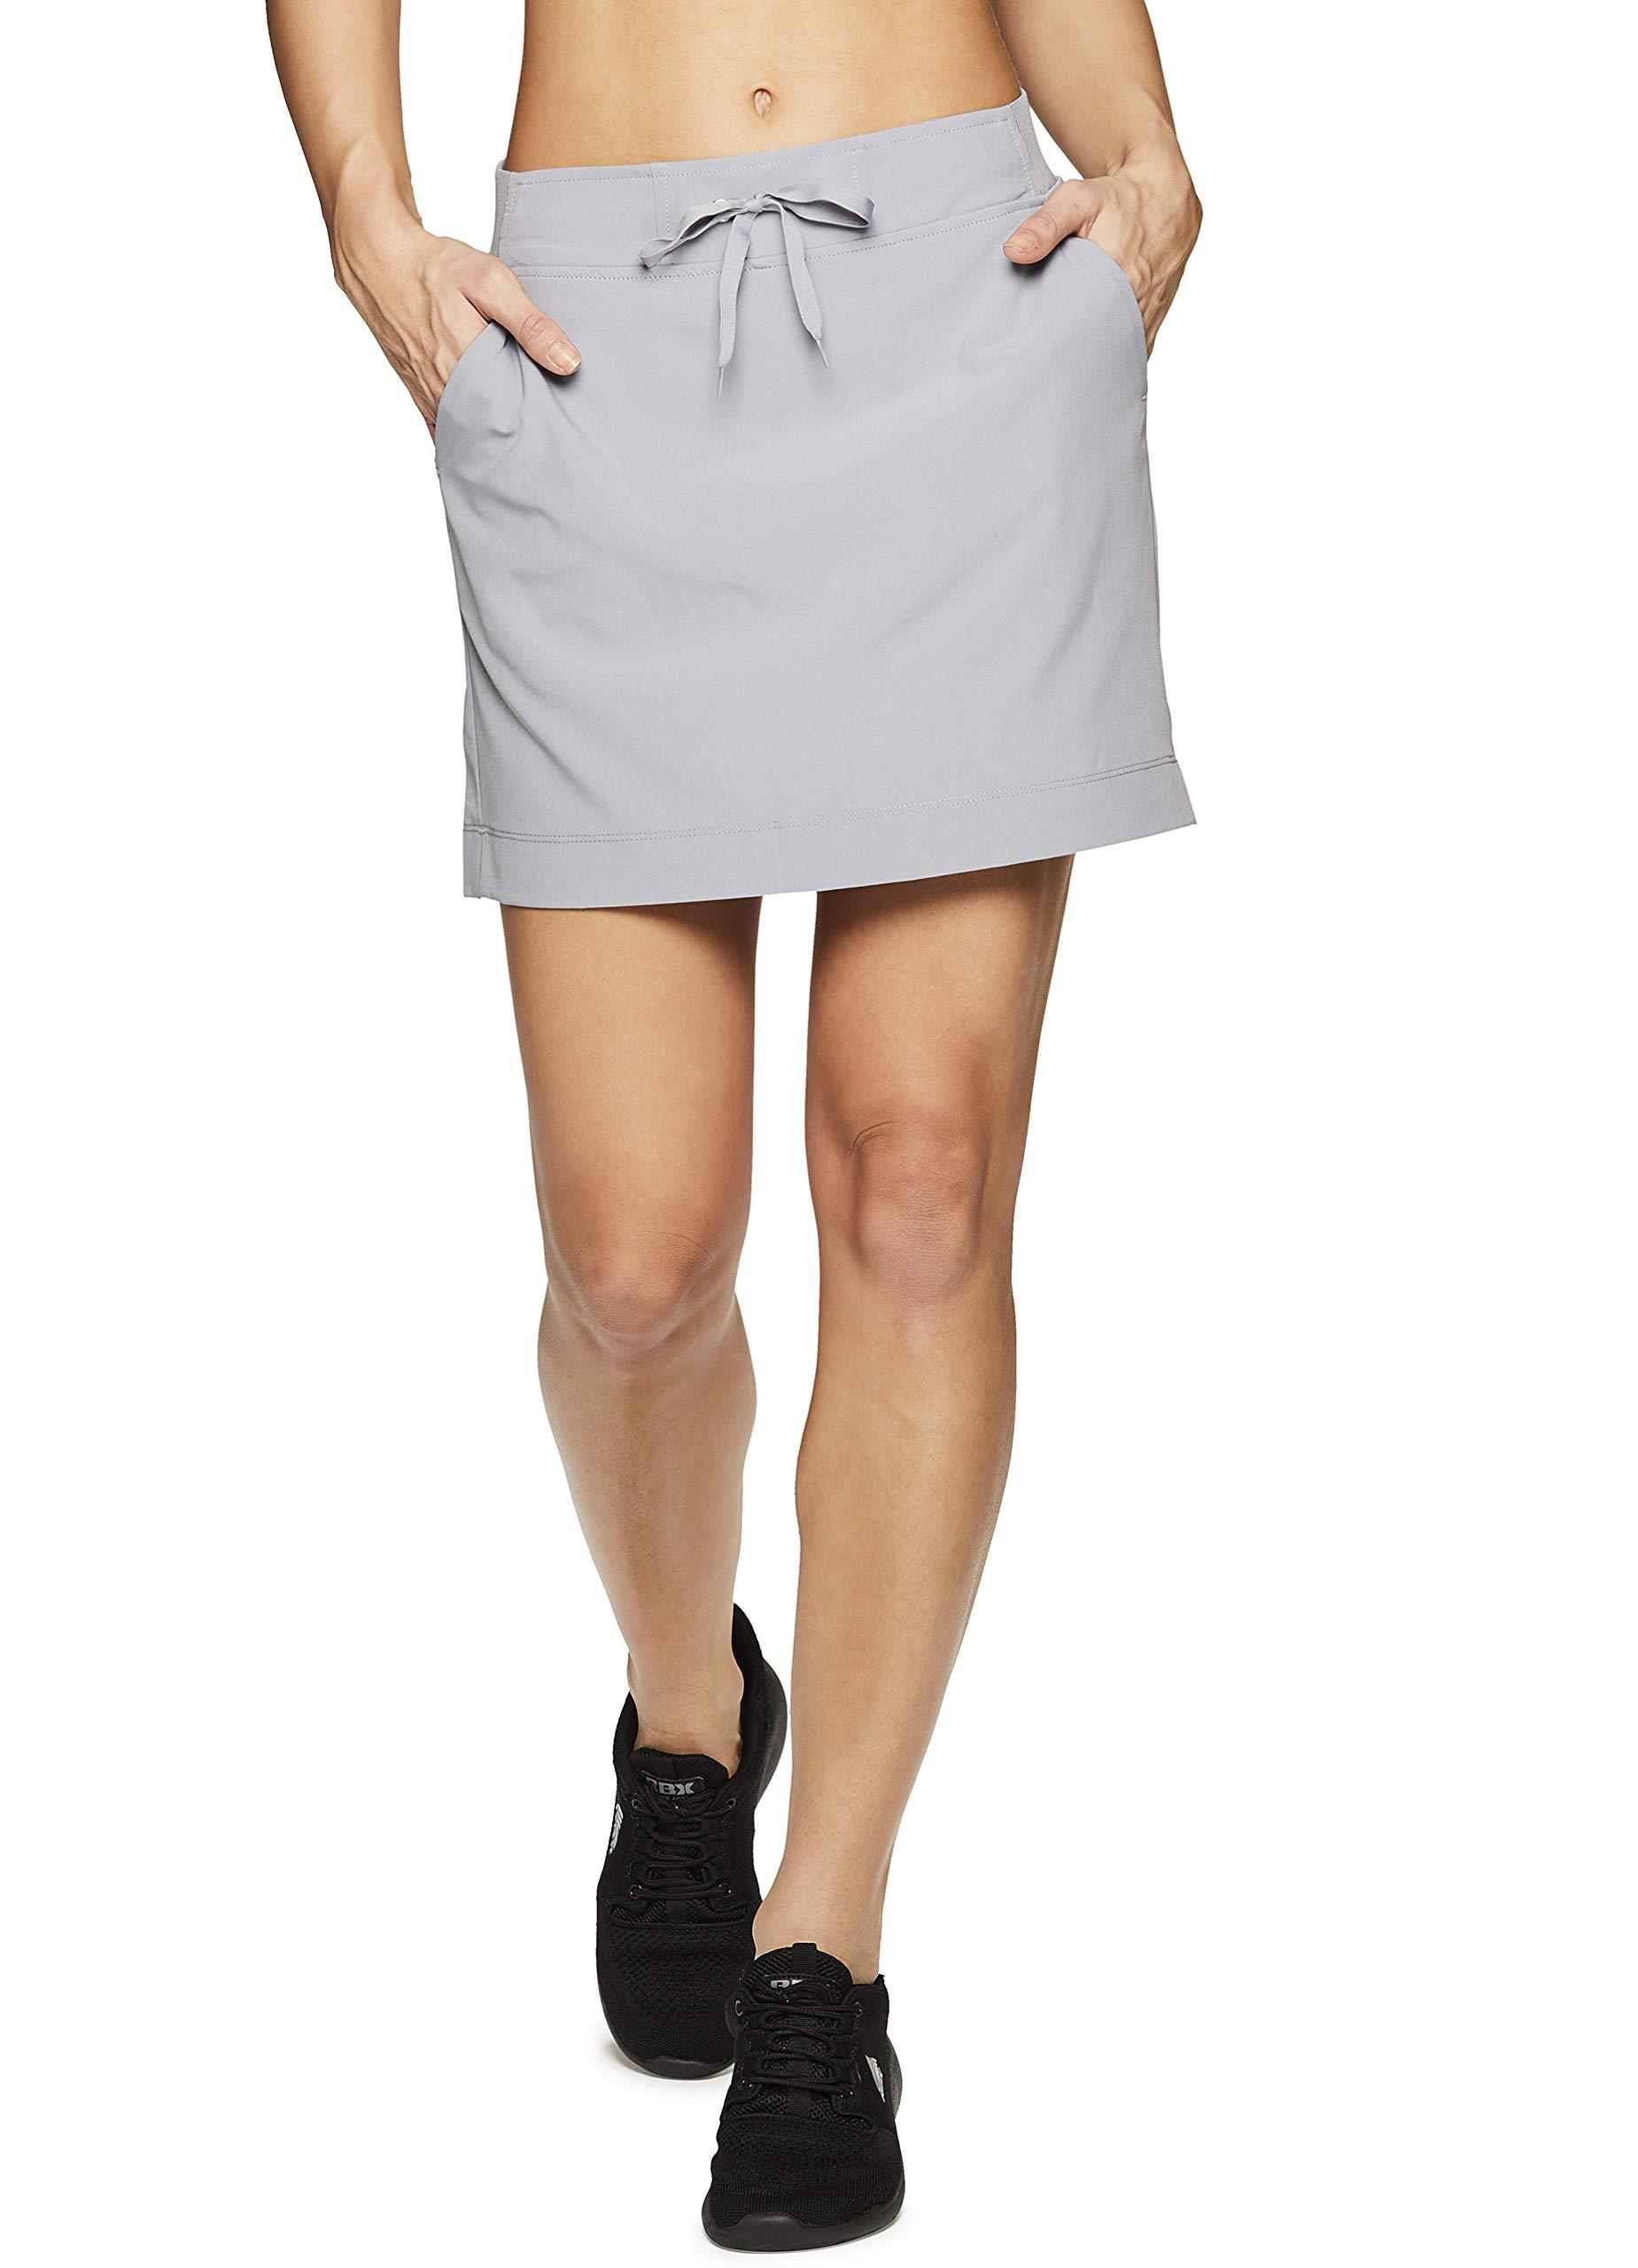 RBX Active Women's Golf/Tennis Athletic Skort with Bike Shorts S19 Grey S